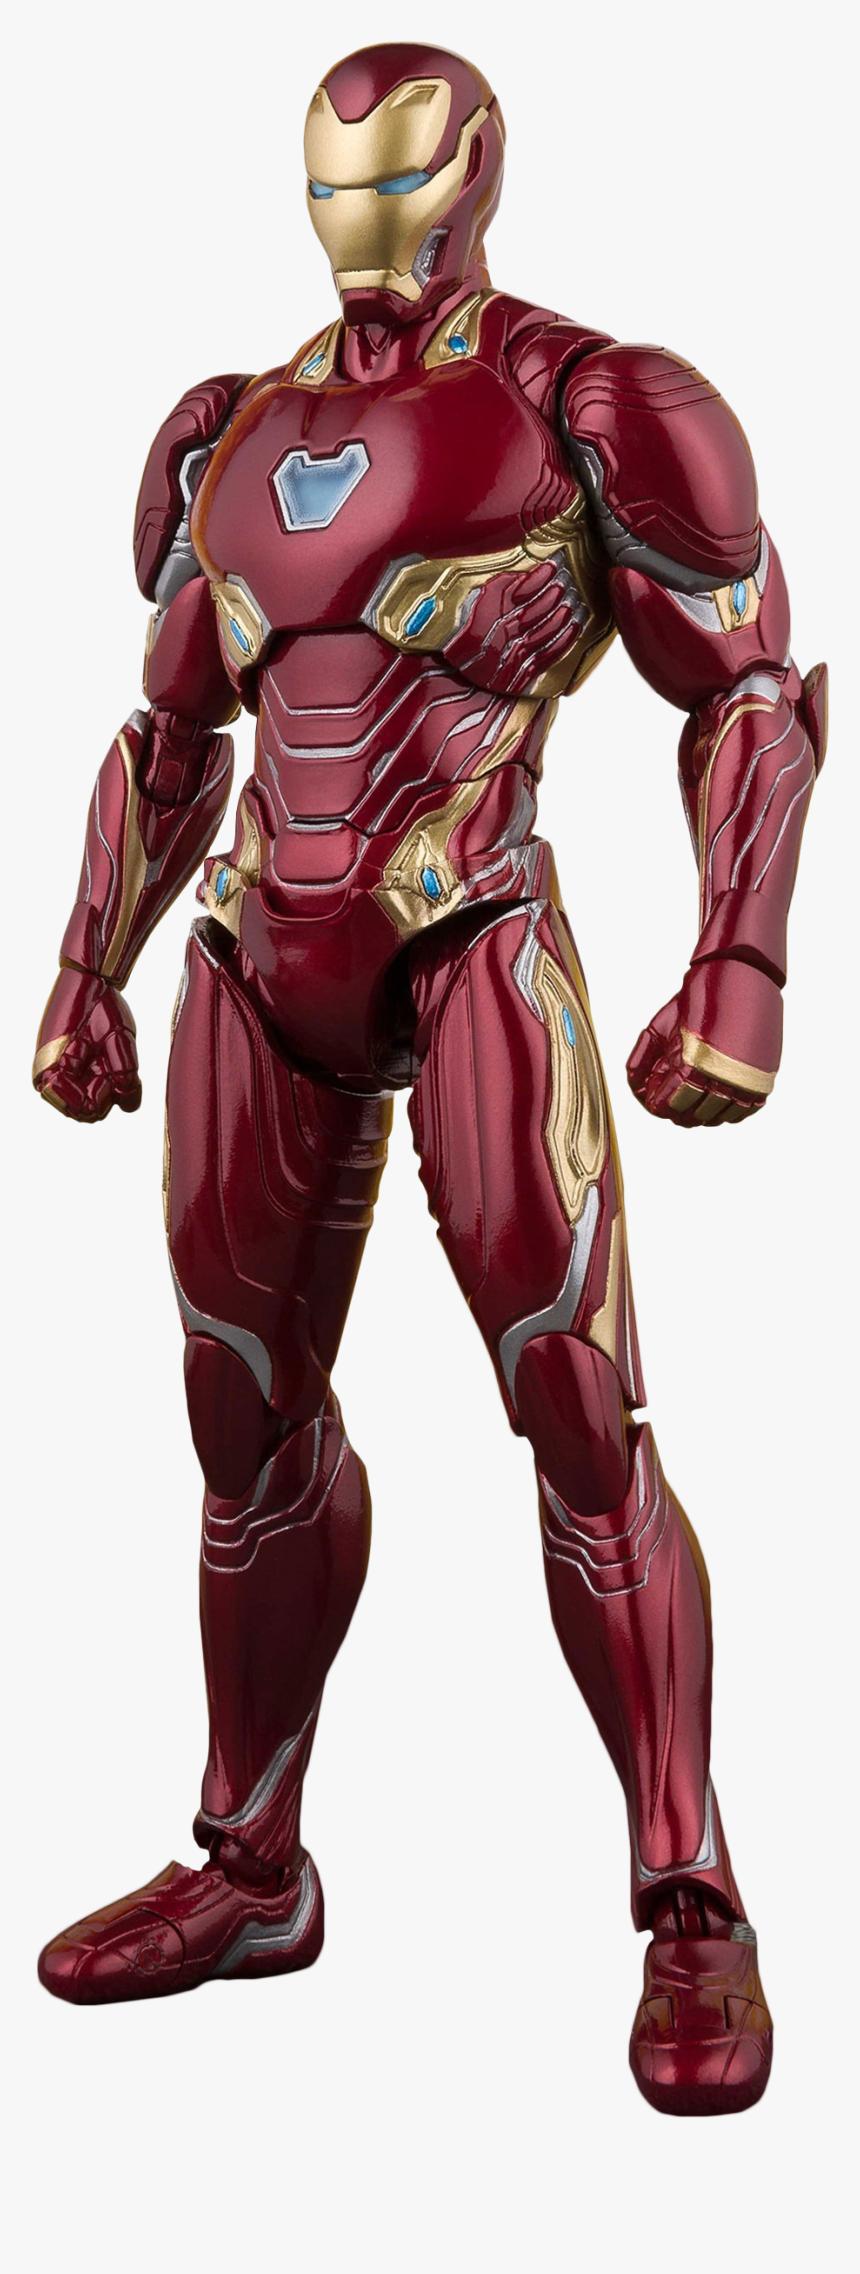 Sh Figuarts Iron Man Mark 50 , Png Download, Transparent Png, Free Download